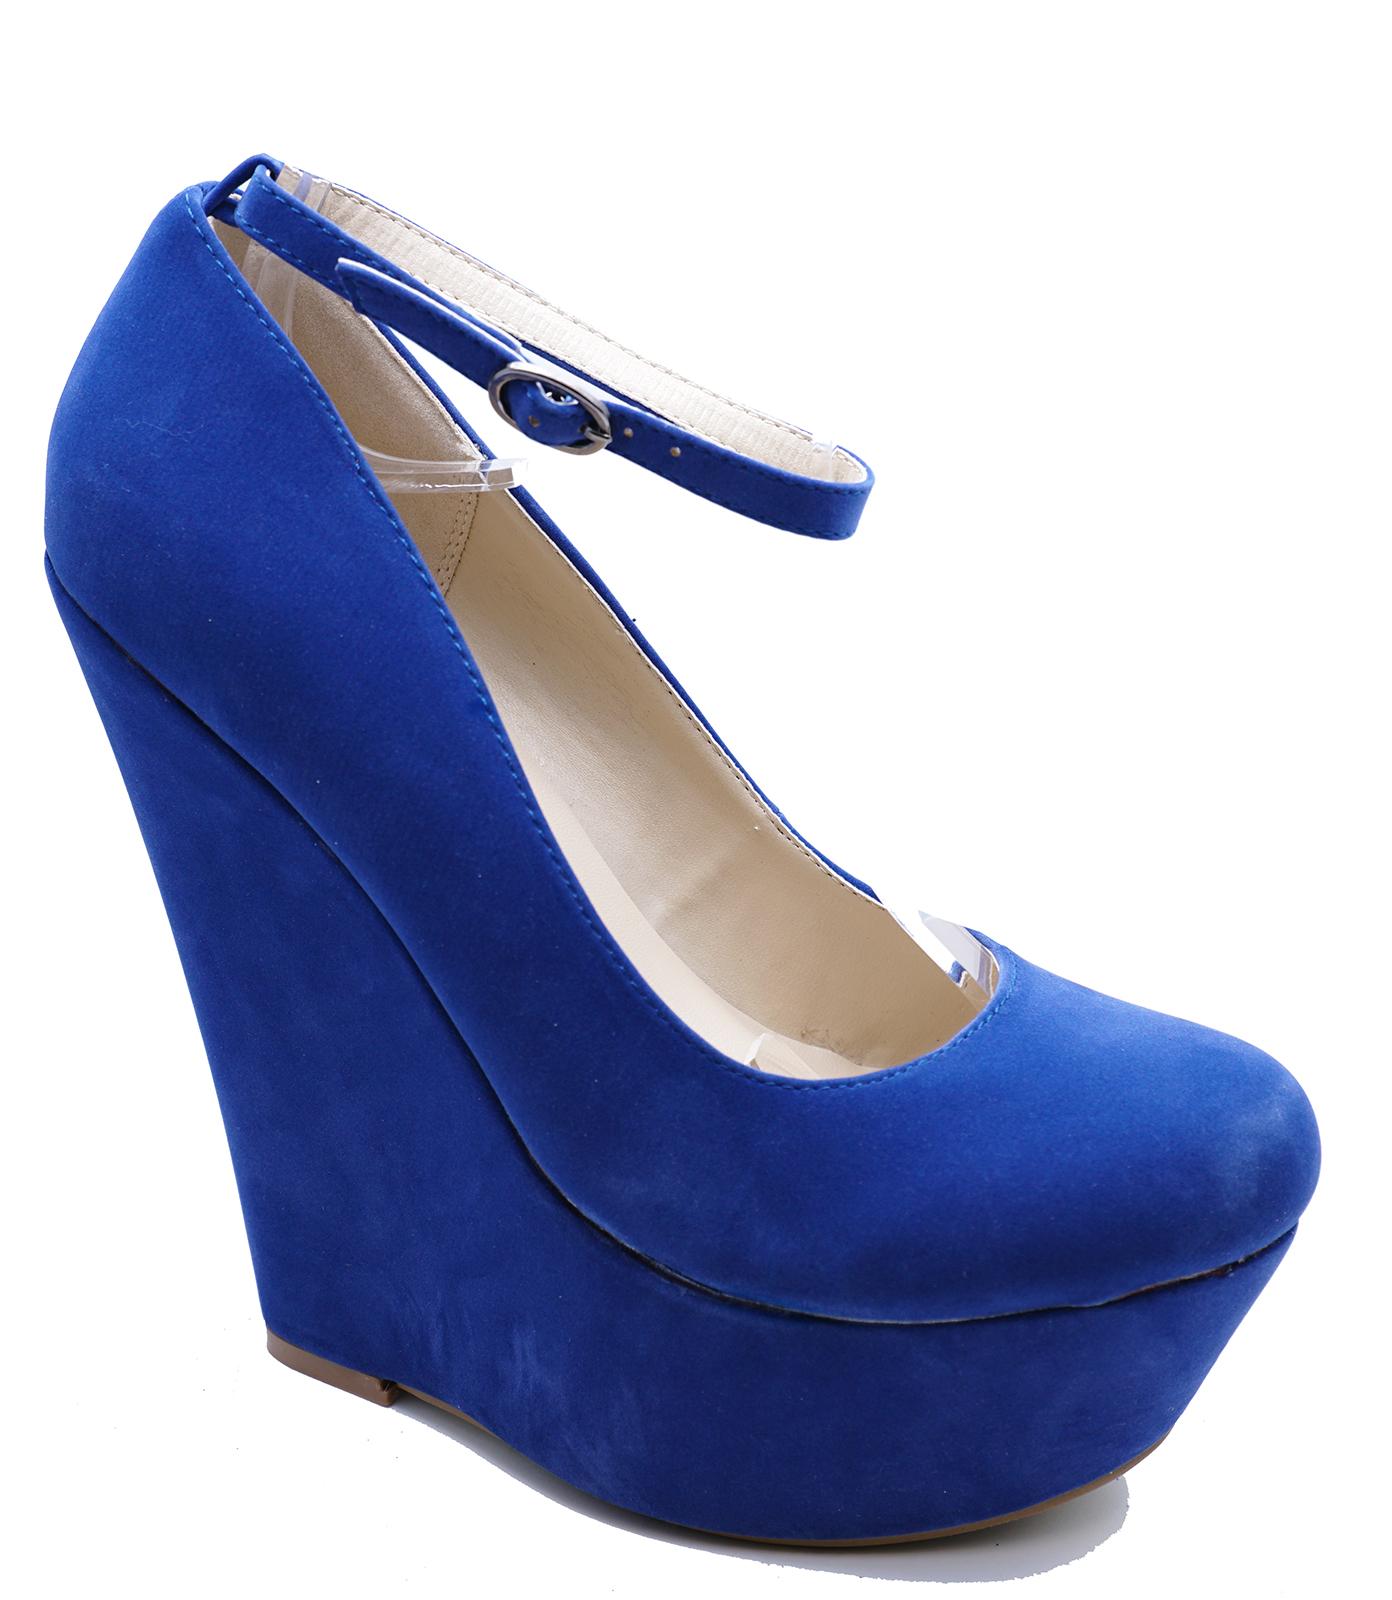 2c9602b0d3a8 Details about WOMENS BLUE FAUX-SUEDE SLIP-ON PLATFORM WEDGES PARTY PROM  SHOES SIZES 3-7